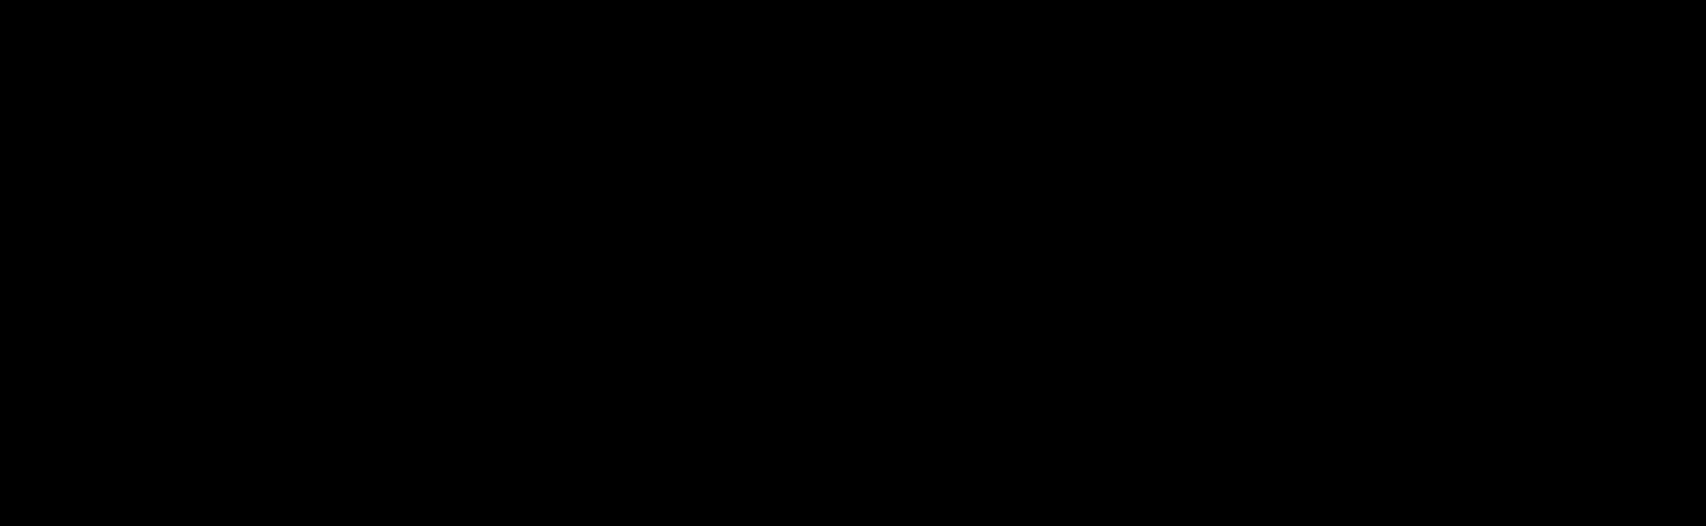 temperature_Screen_Shot_2017-10-11_at_5.52.08_PM.png